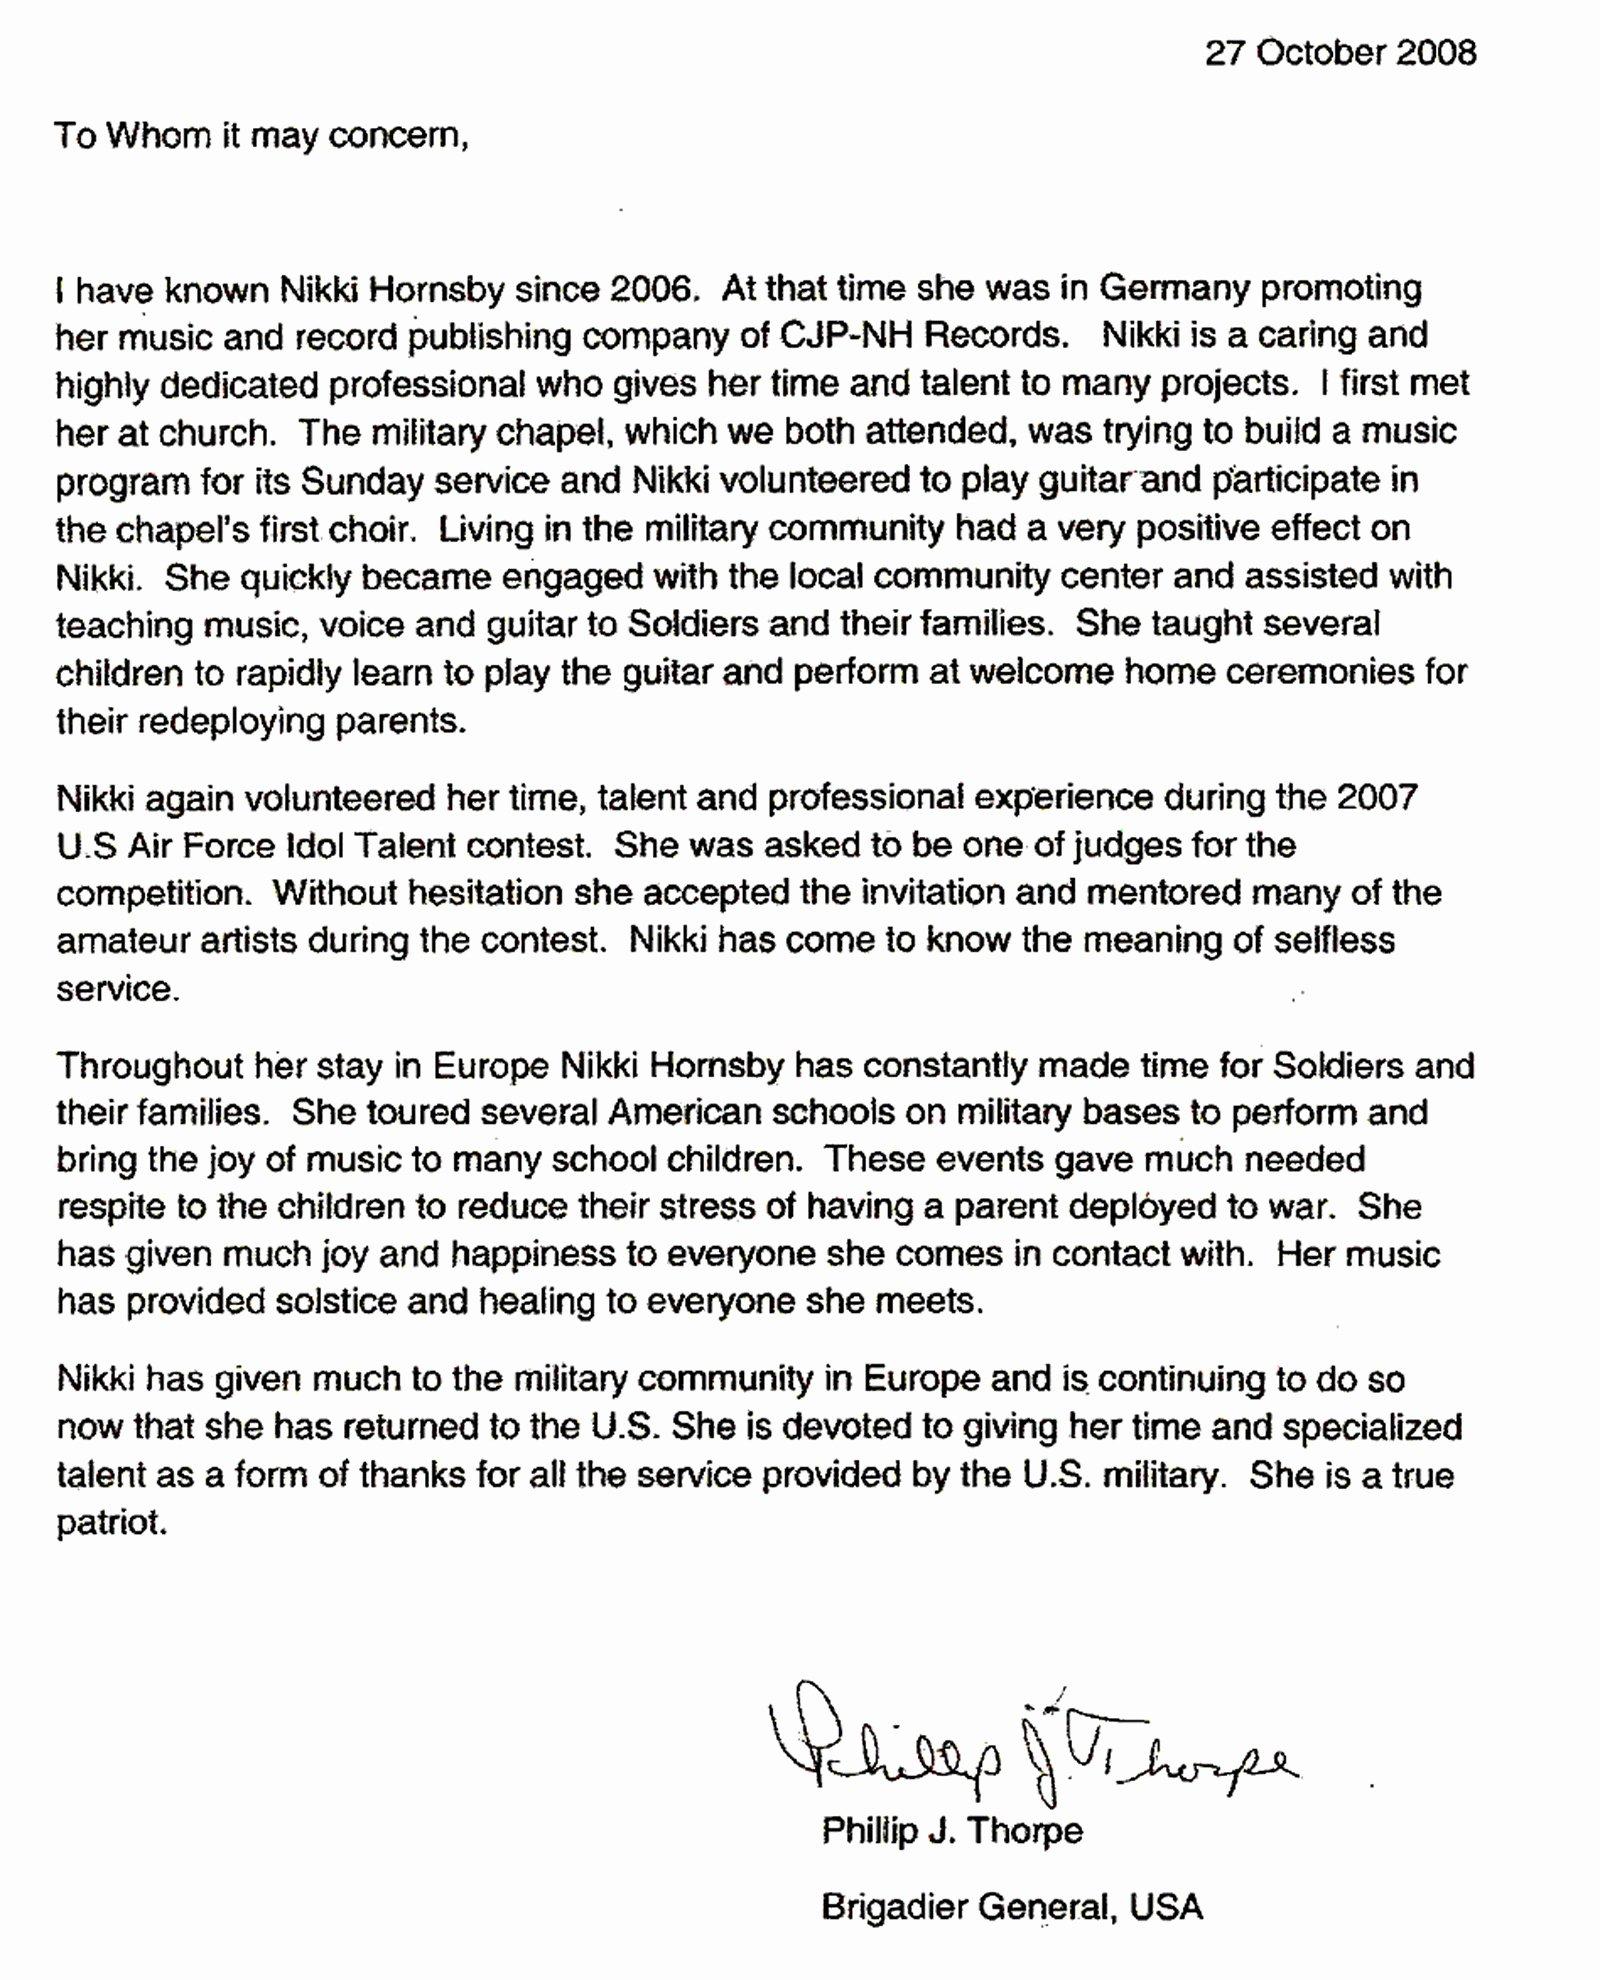 Military Letter Of Recommendation Examples Elegant File Nikki Hornsby Military Re Mendation Letter